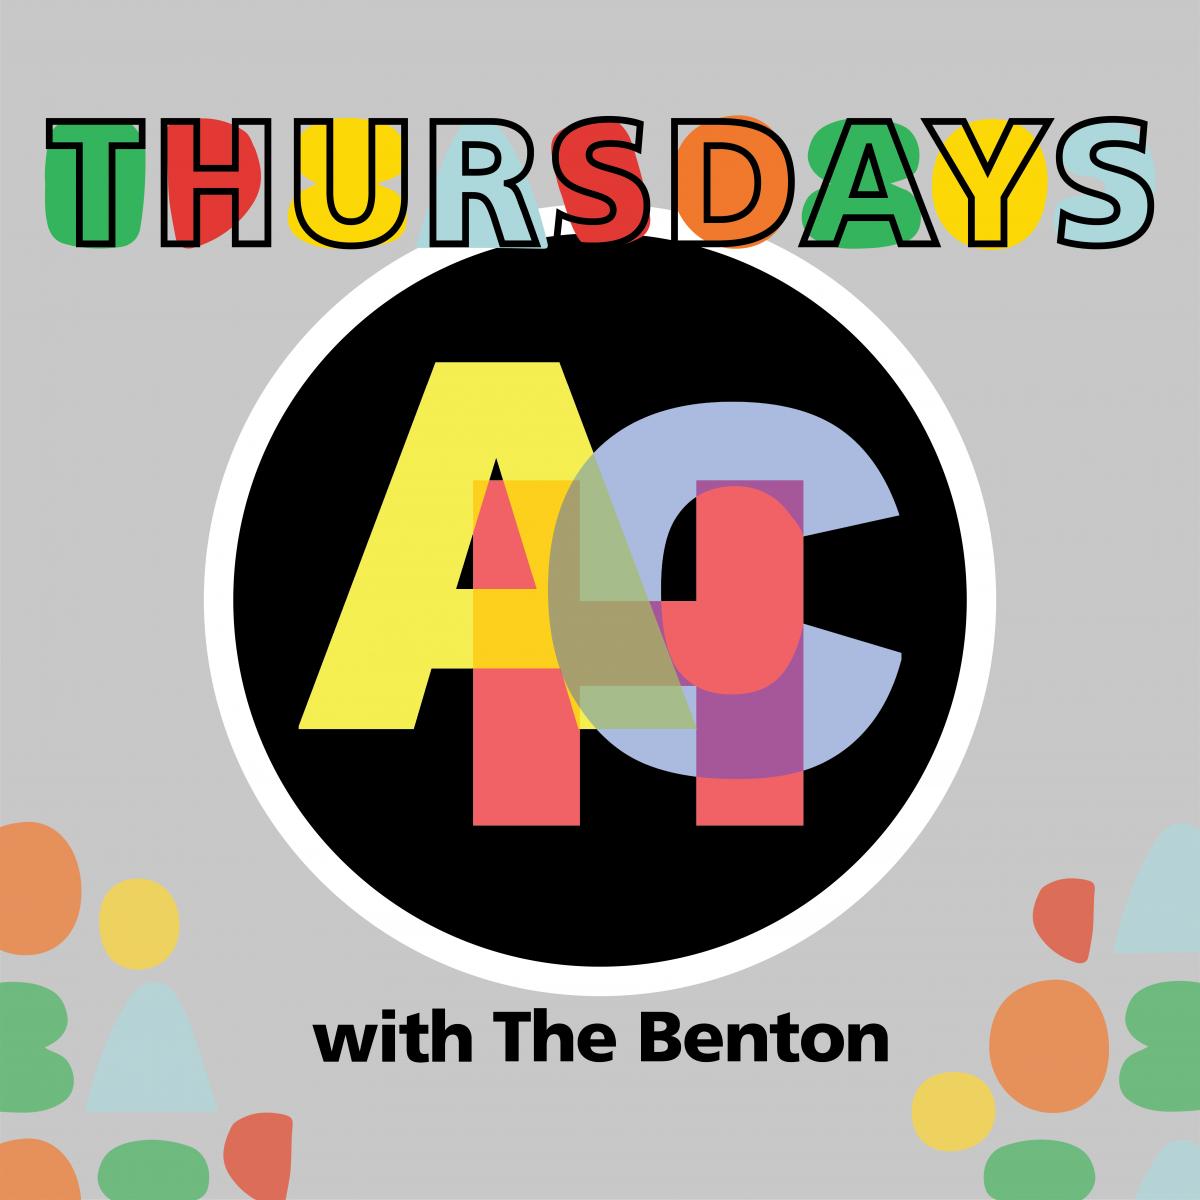 Thursdays with The Benton logo